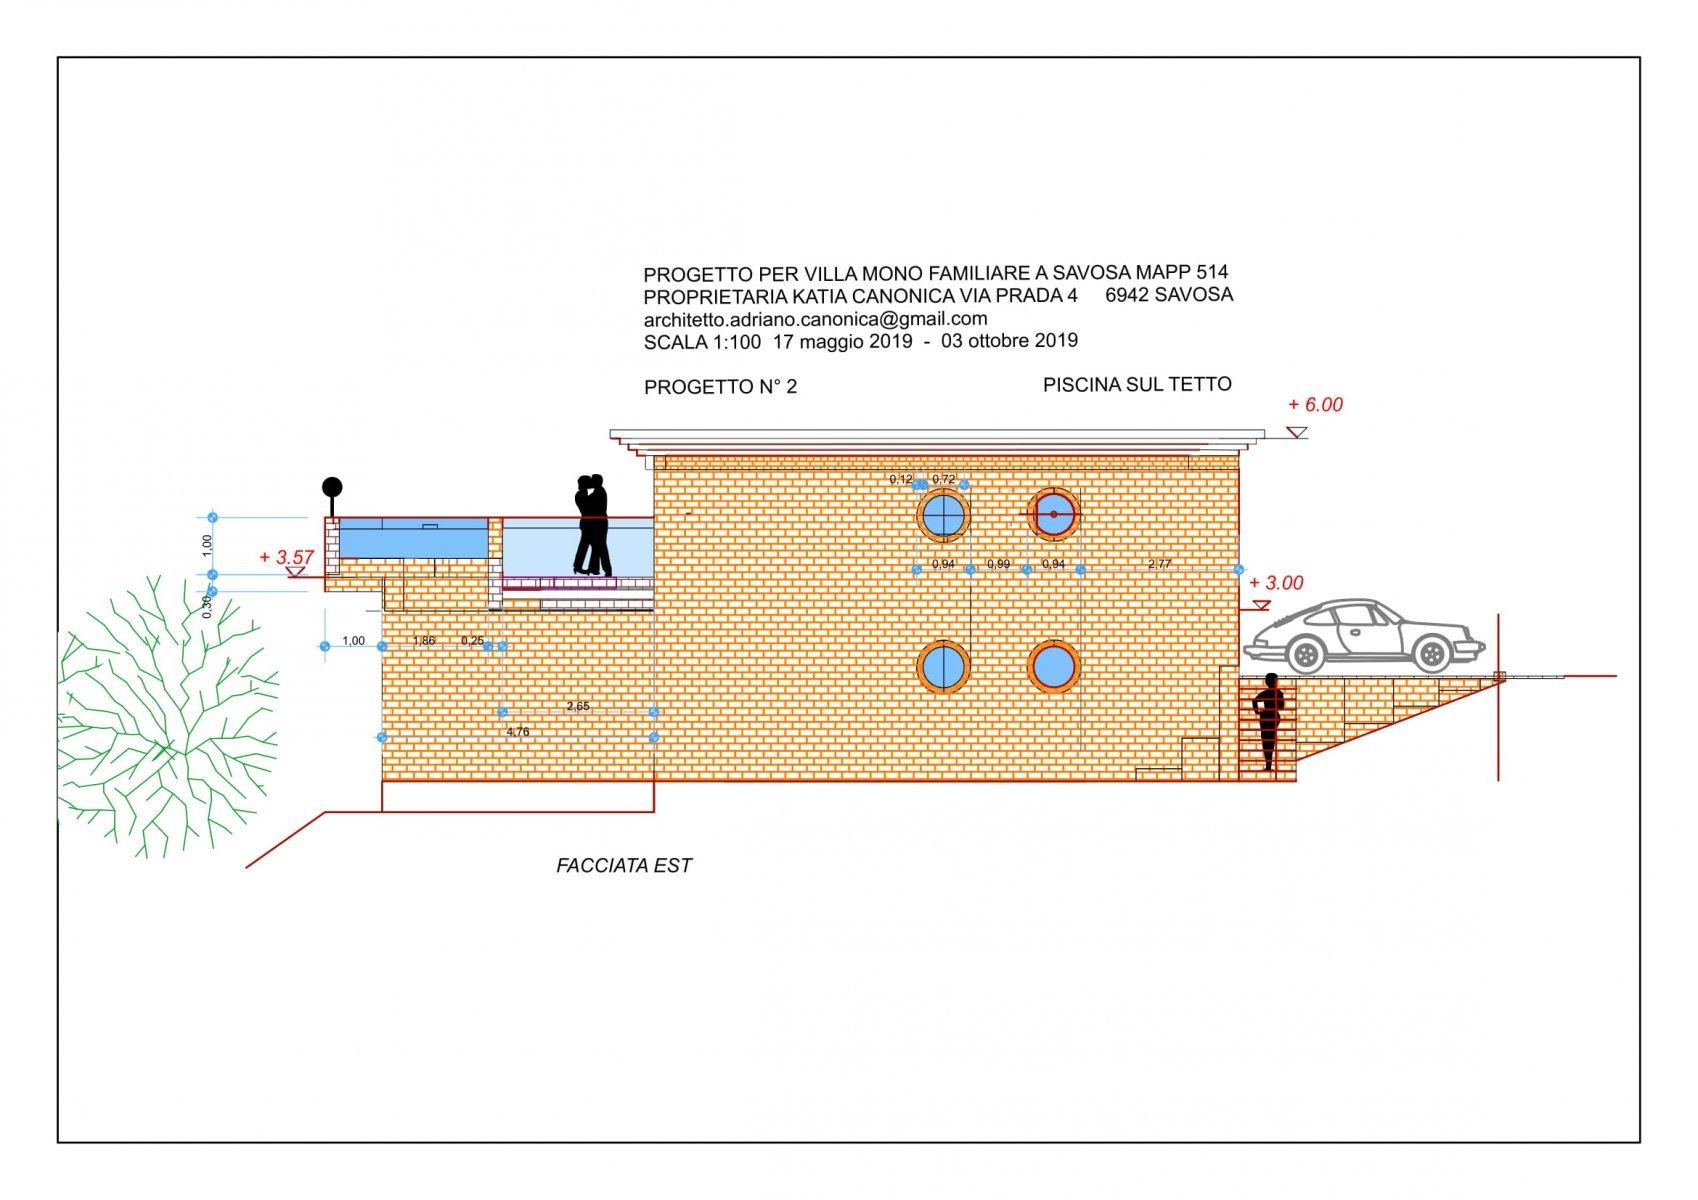 piscina-sul-tetto-facciata-est-1-100-1